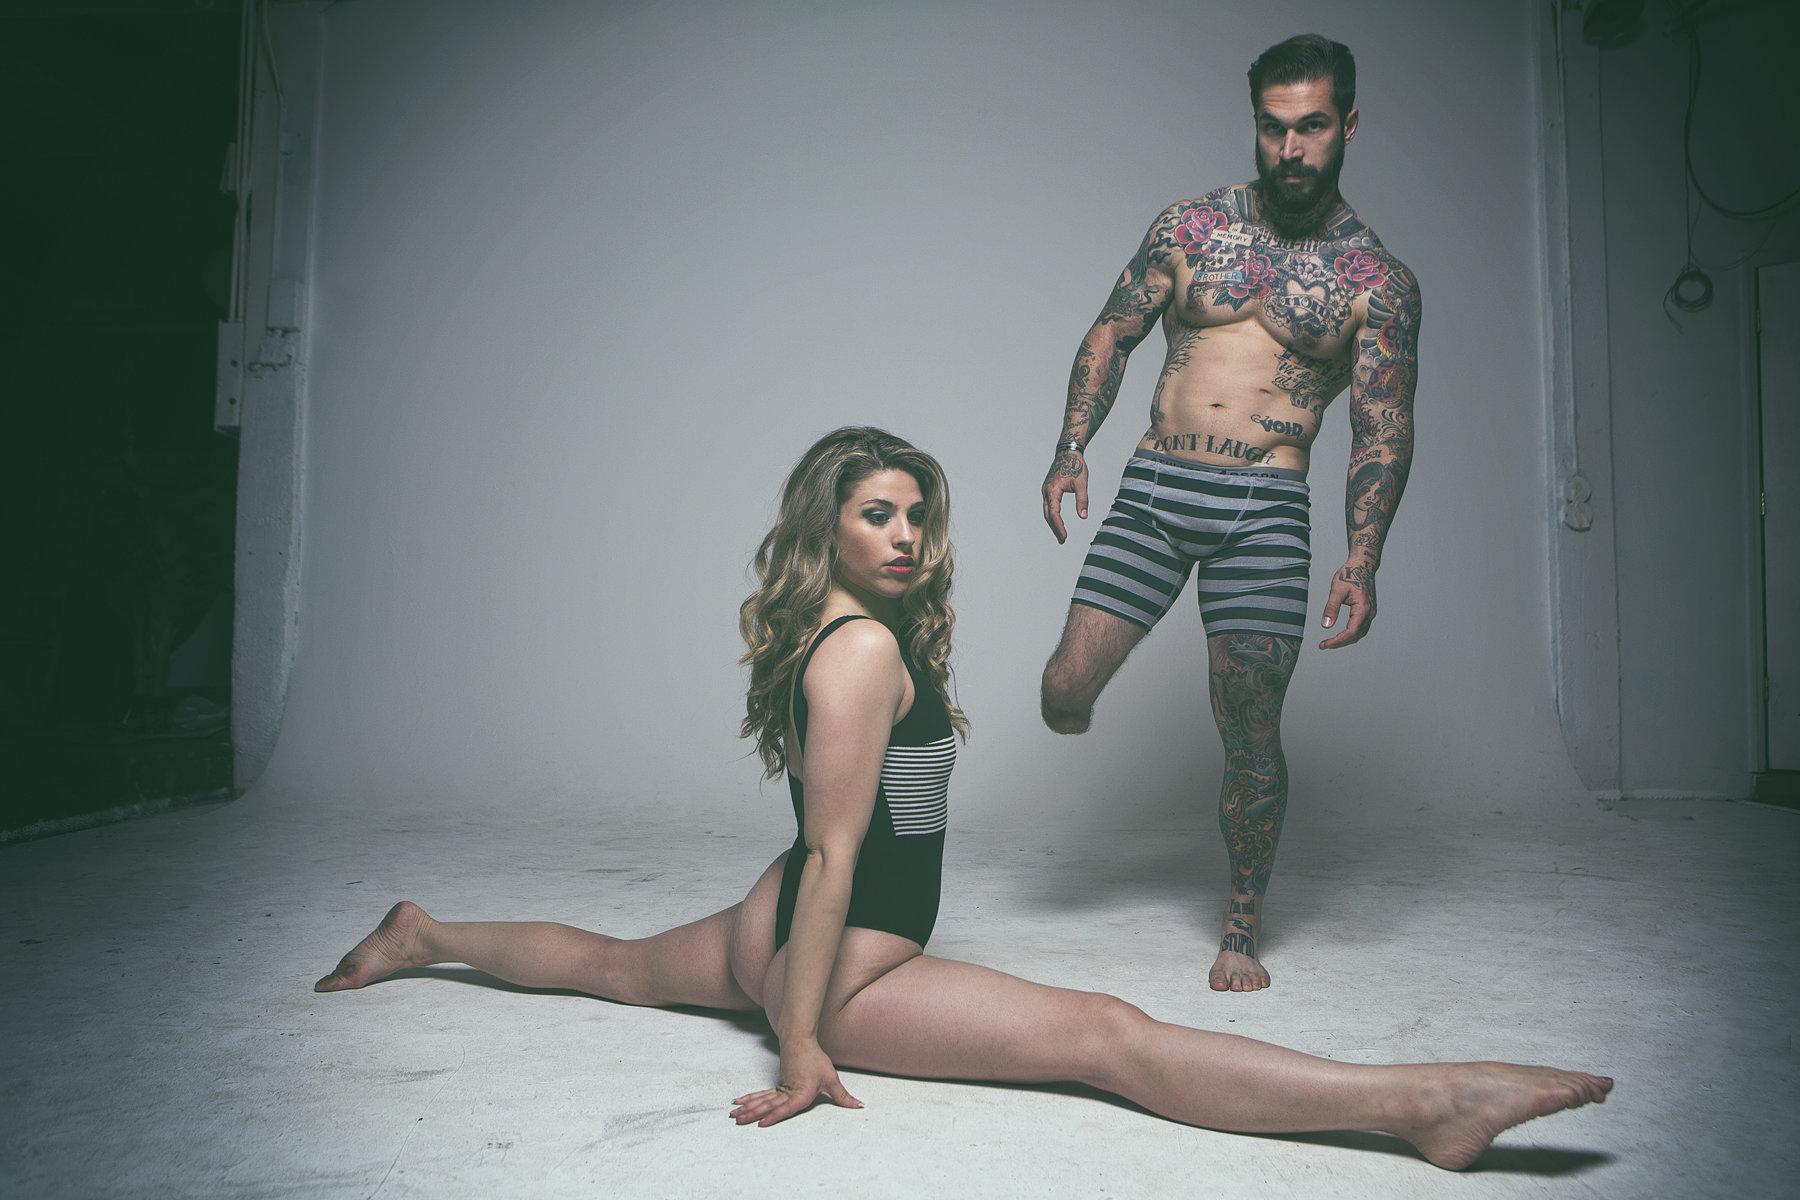 Alex Minsky & Amanda Topchik